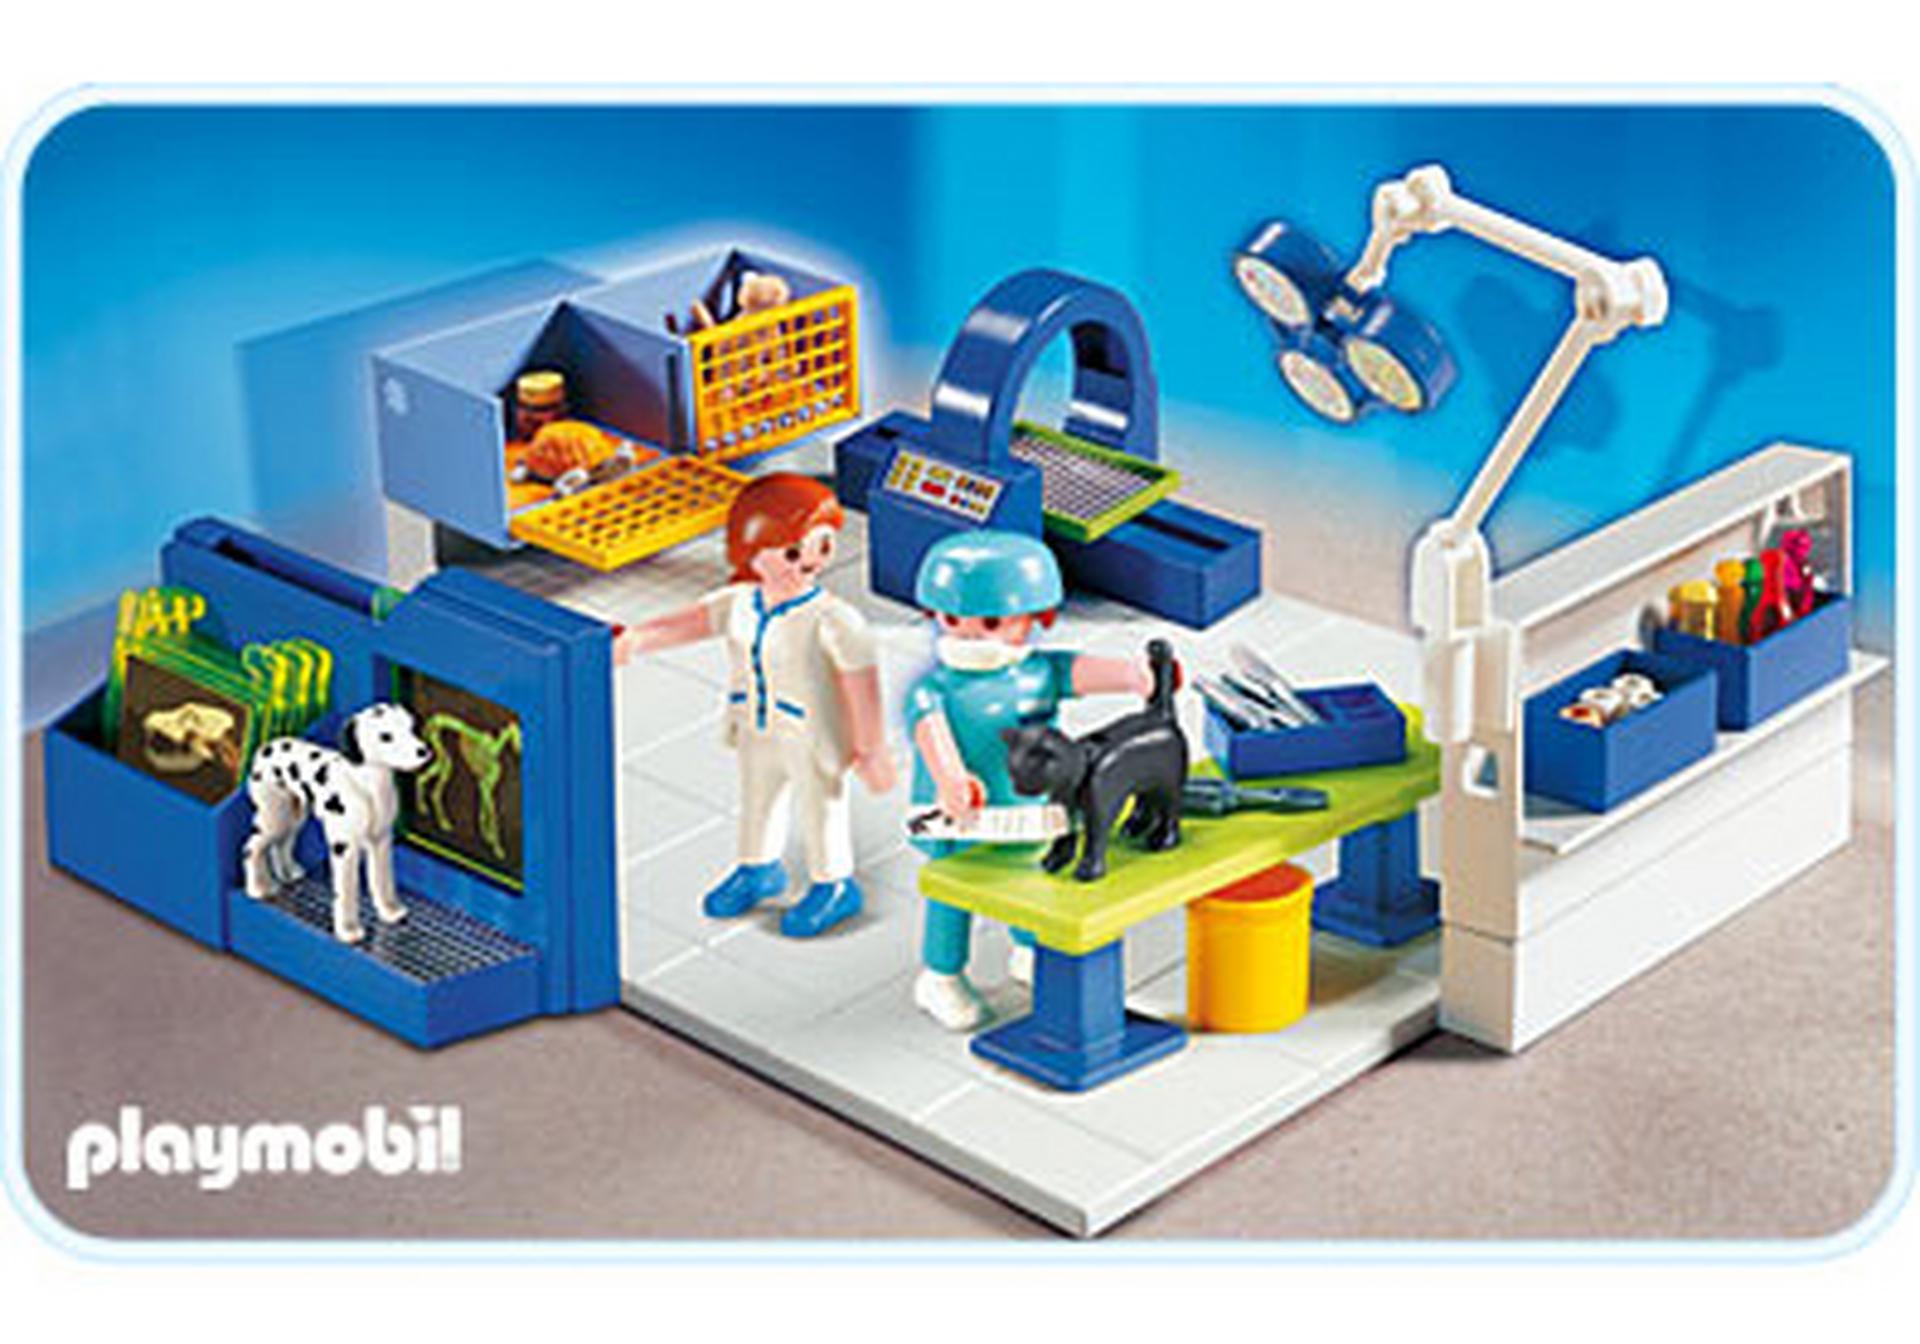 Mediaplaymobil I Playmobil 4346